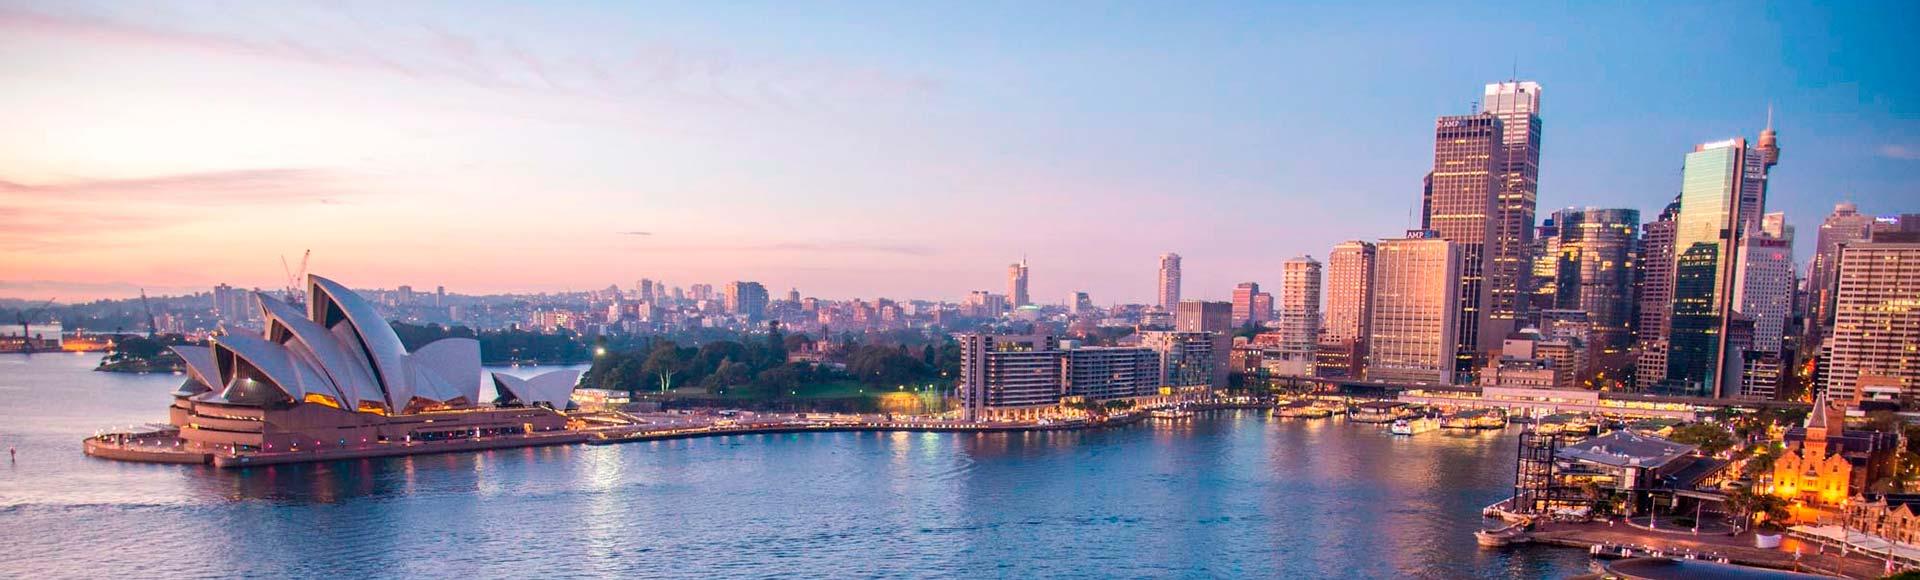 Cursos de inglés en Sidney Australia para adultos